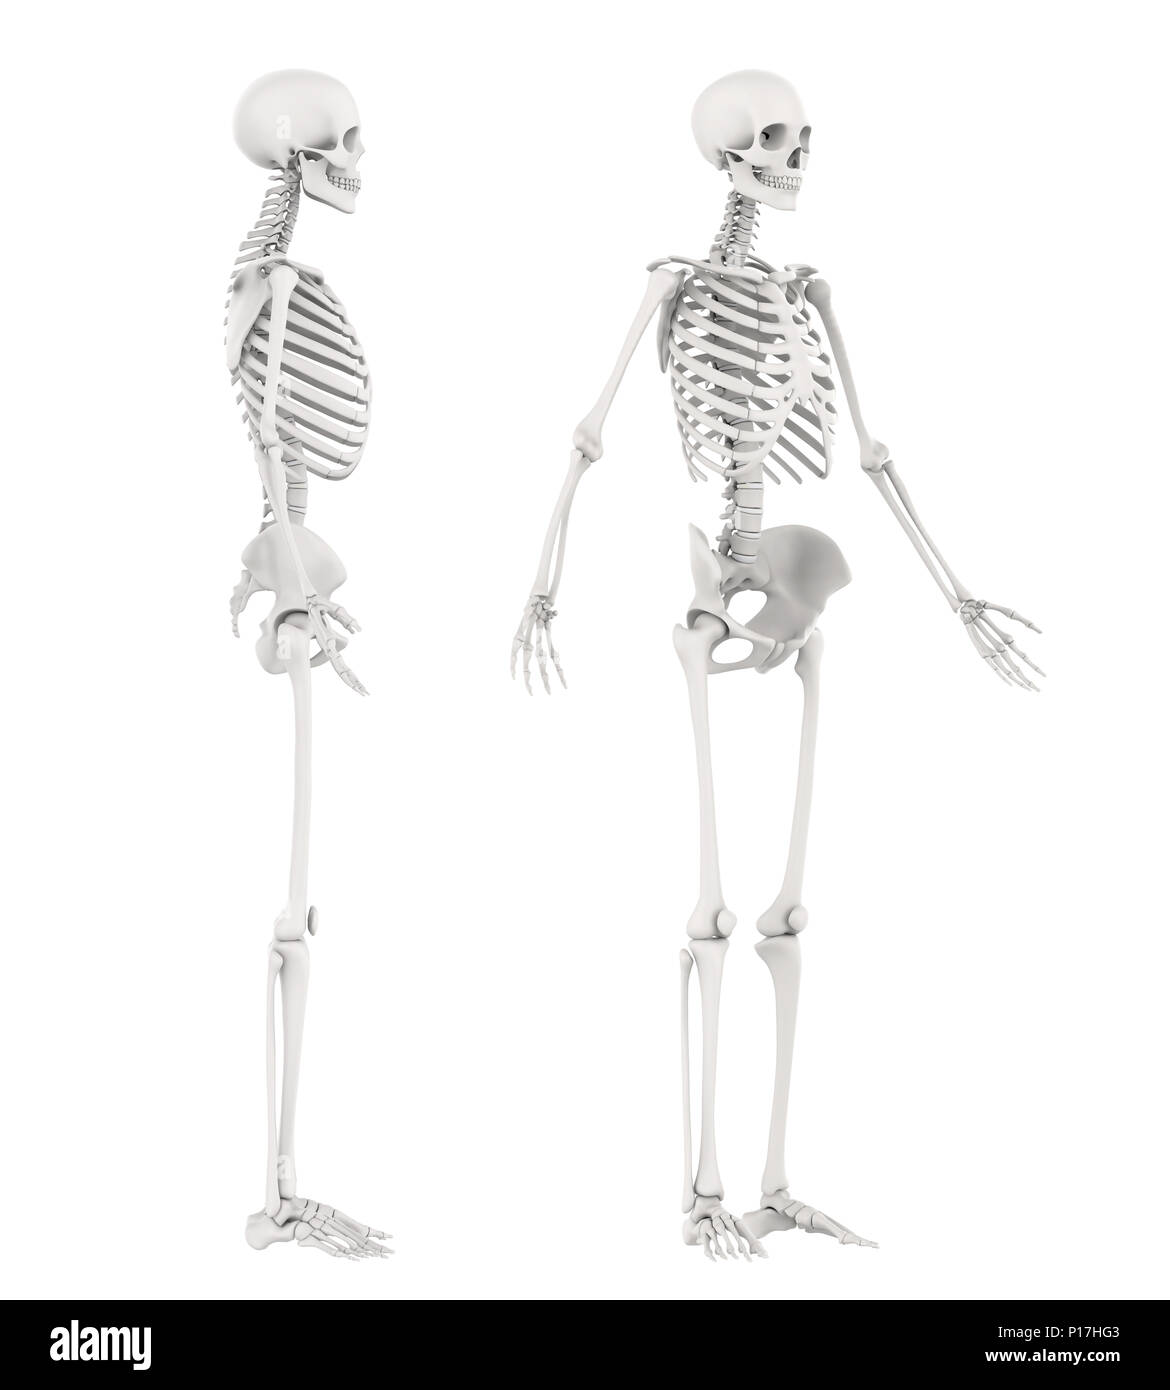 Human Spine Bone Man Side View Stock Photos & Human Spine Bone Man ...